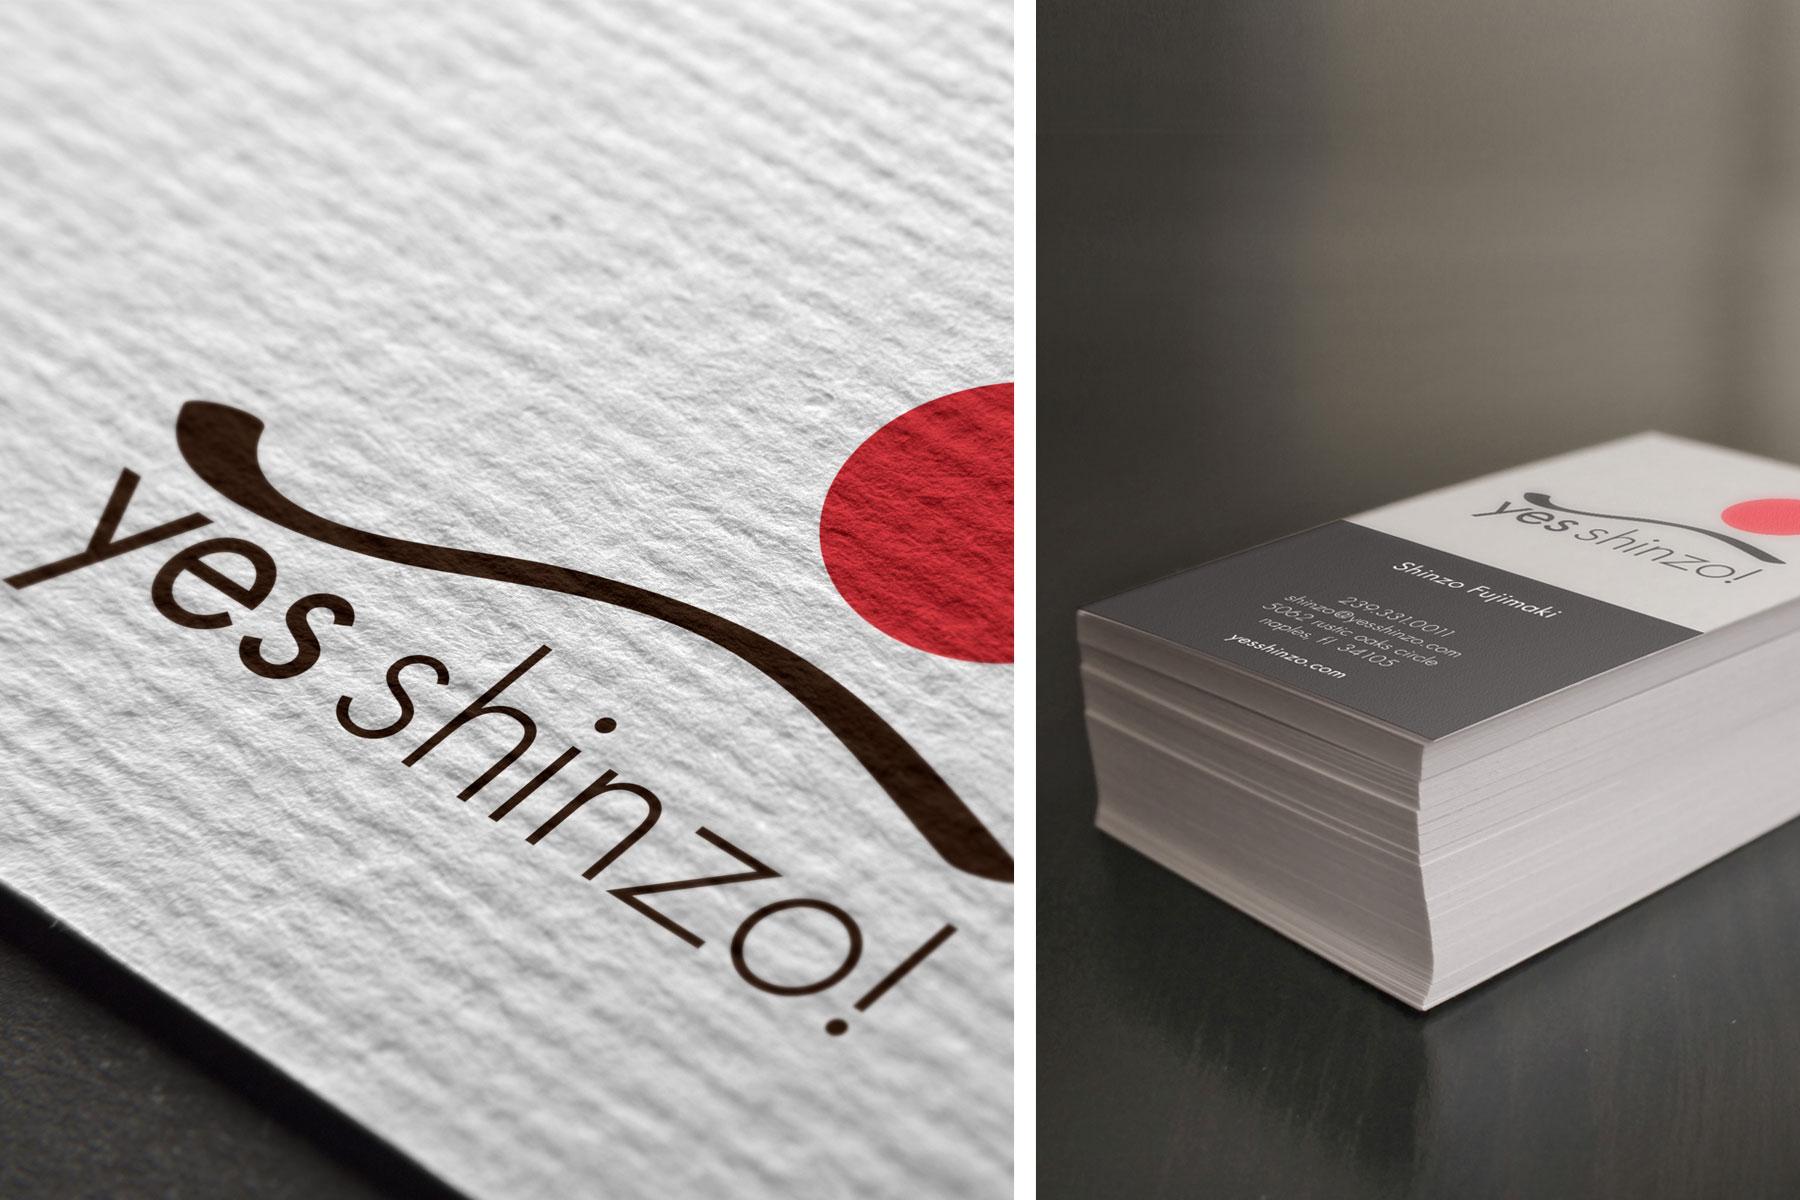 shinzo_s1.jpg